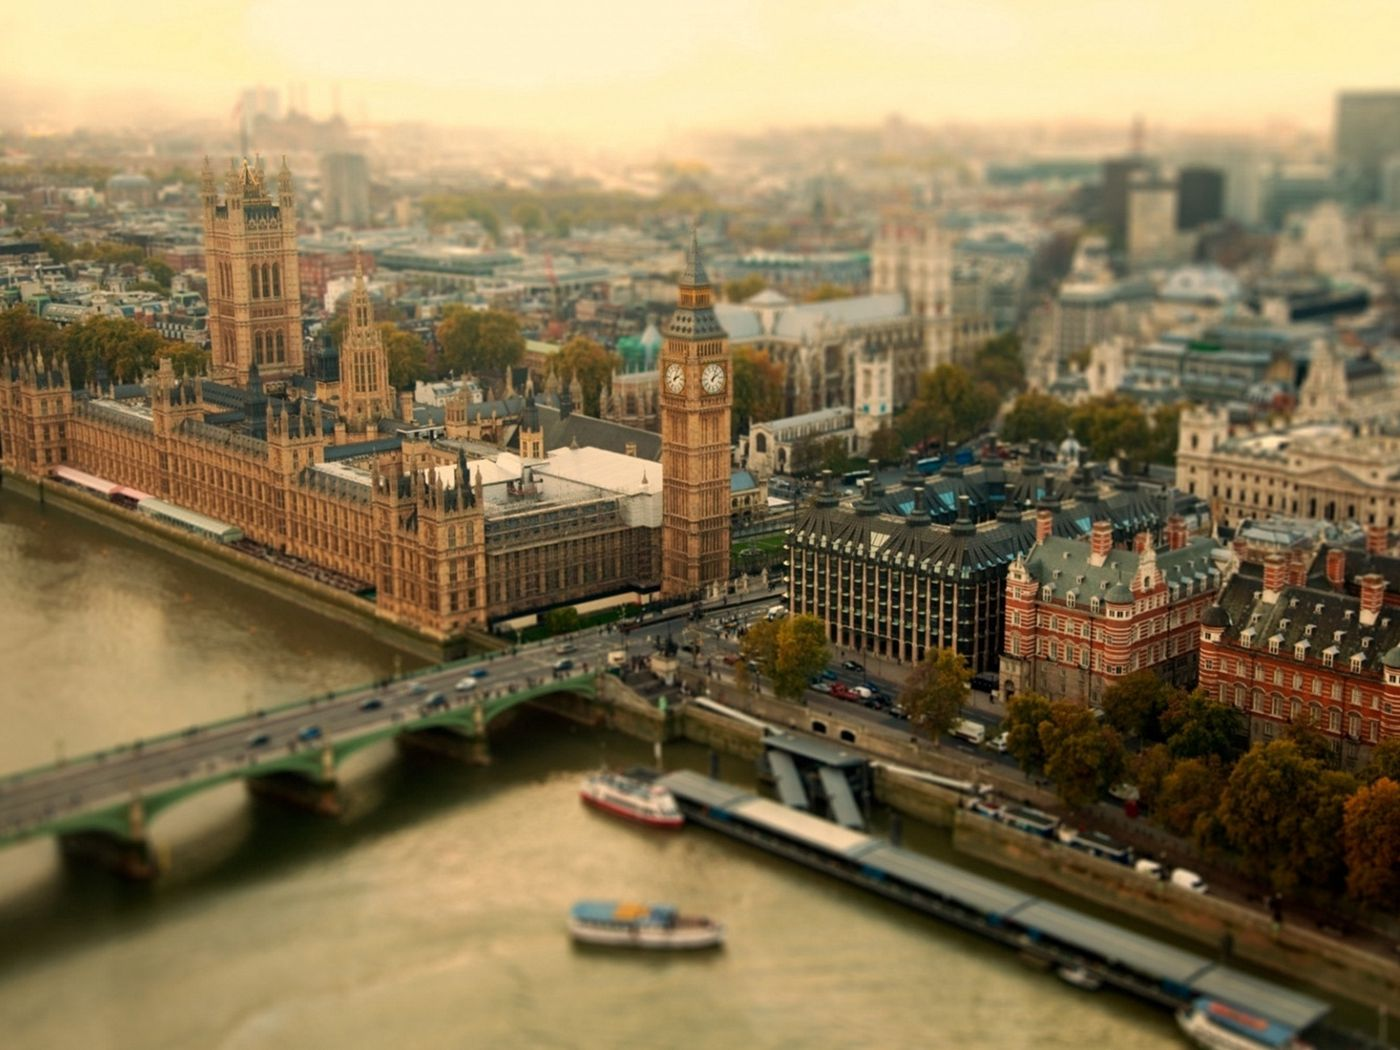 1400x1050 Wallpaper london, uk, city, tower bridge